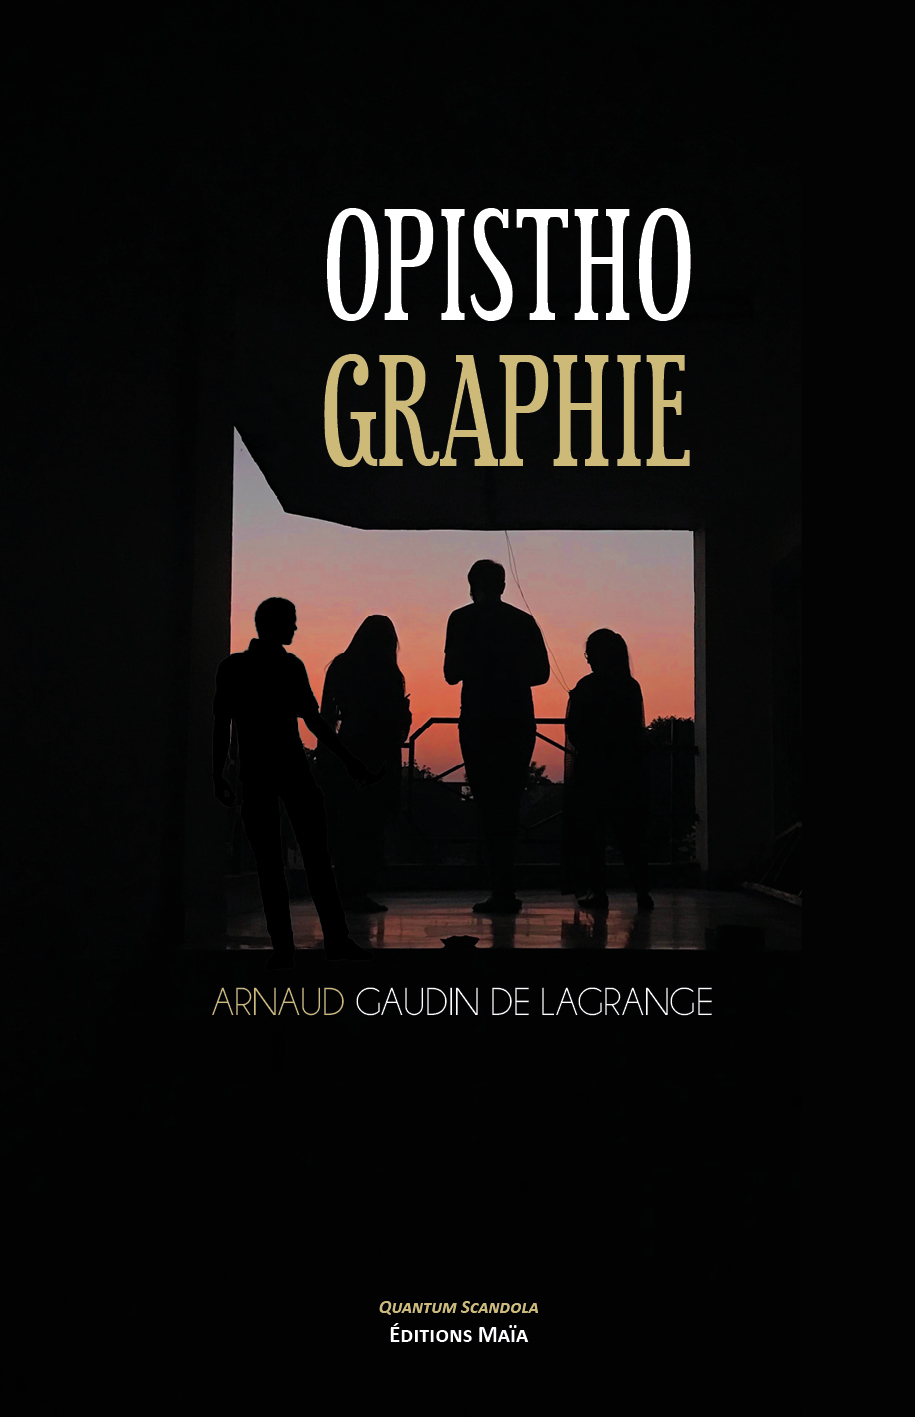 Entretien avec Arnaud Gaudin de Lagrange – Opisthographie